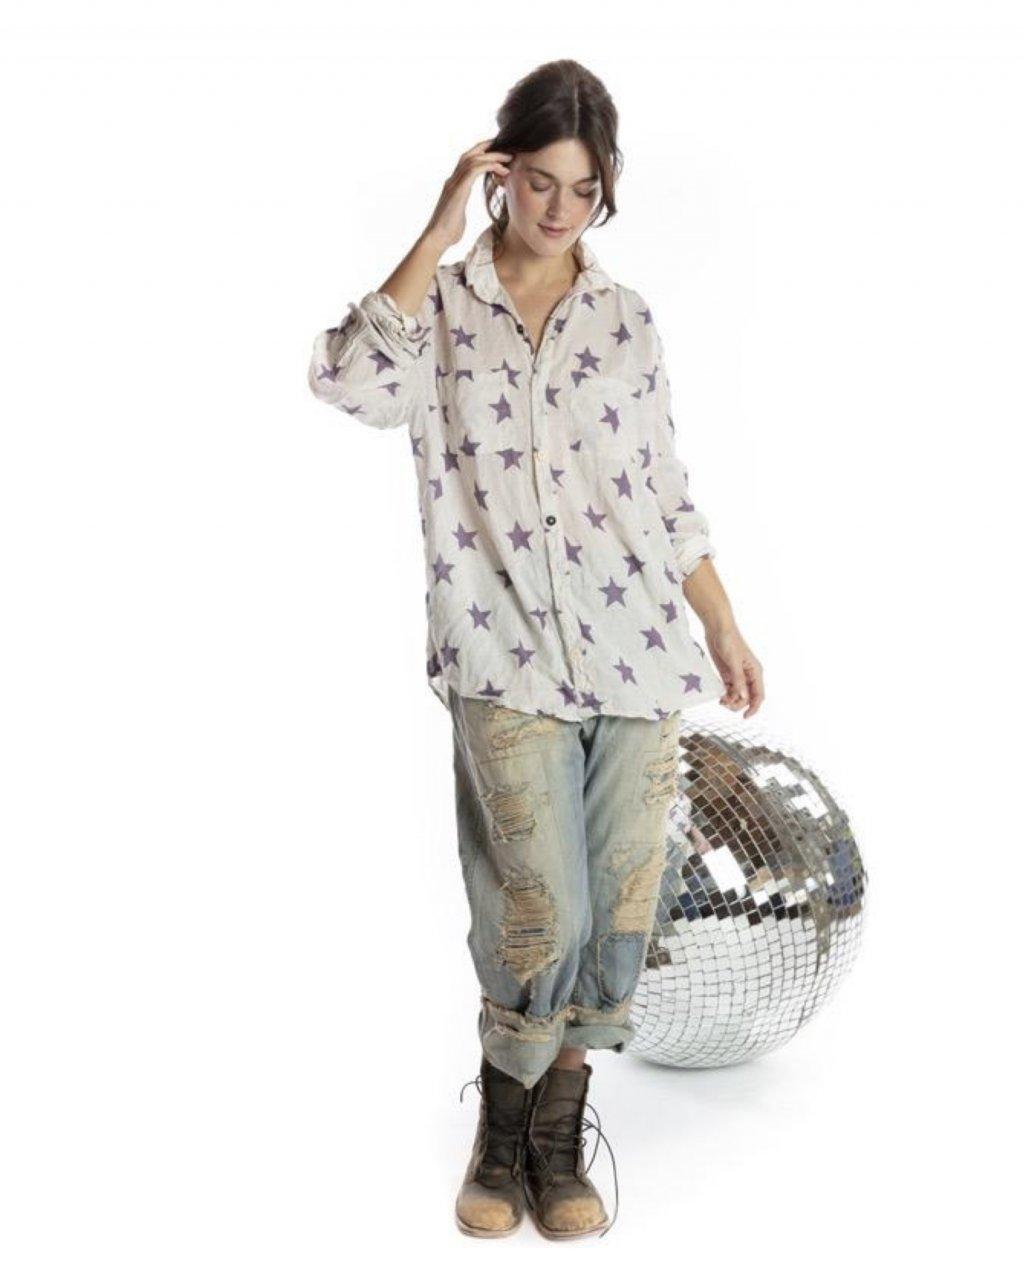 Magnolia Pearl | Boyfriend Shirt | Twinkle Little Star | European Cotton